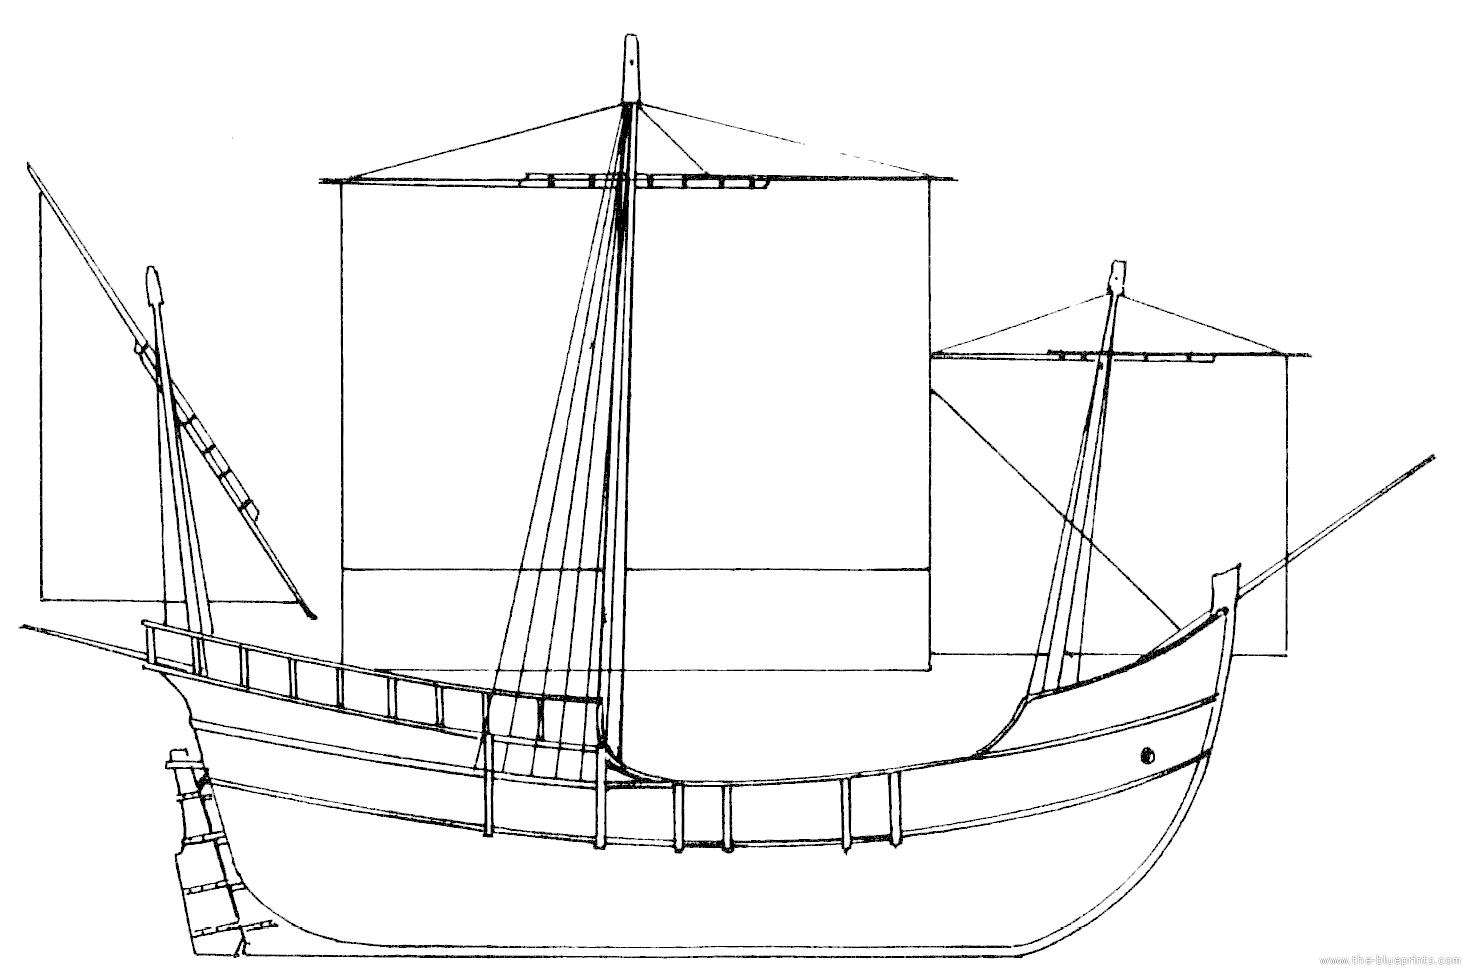 Blueprints > Ships > Ships (Other) > Pinta (1492)